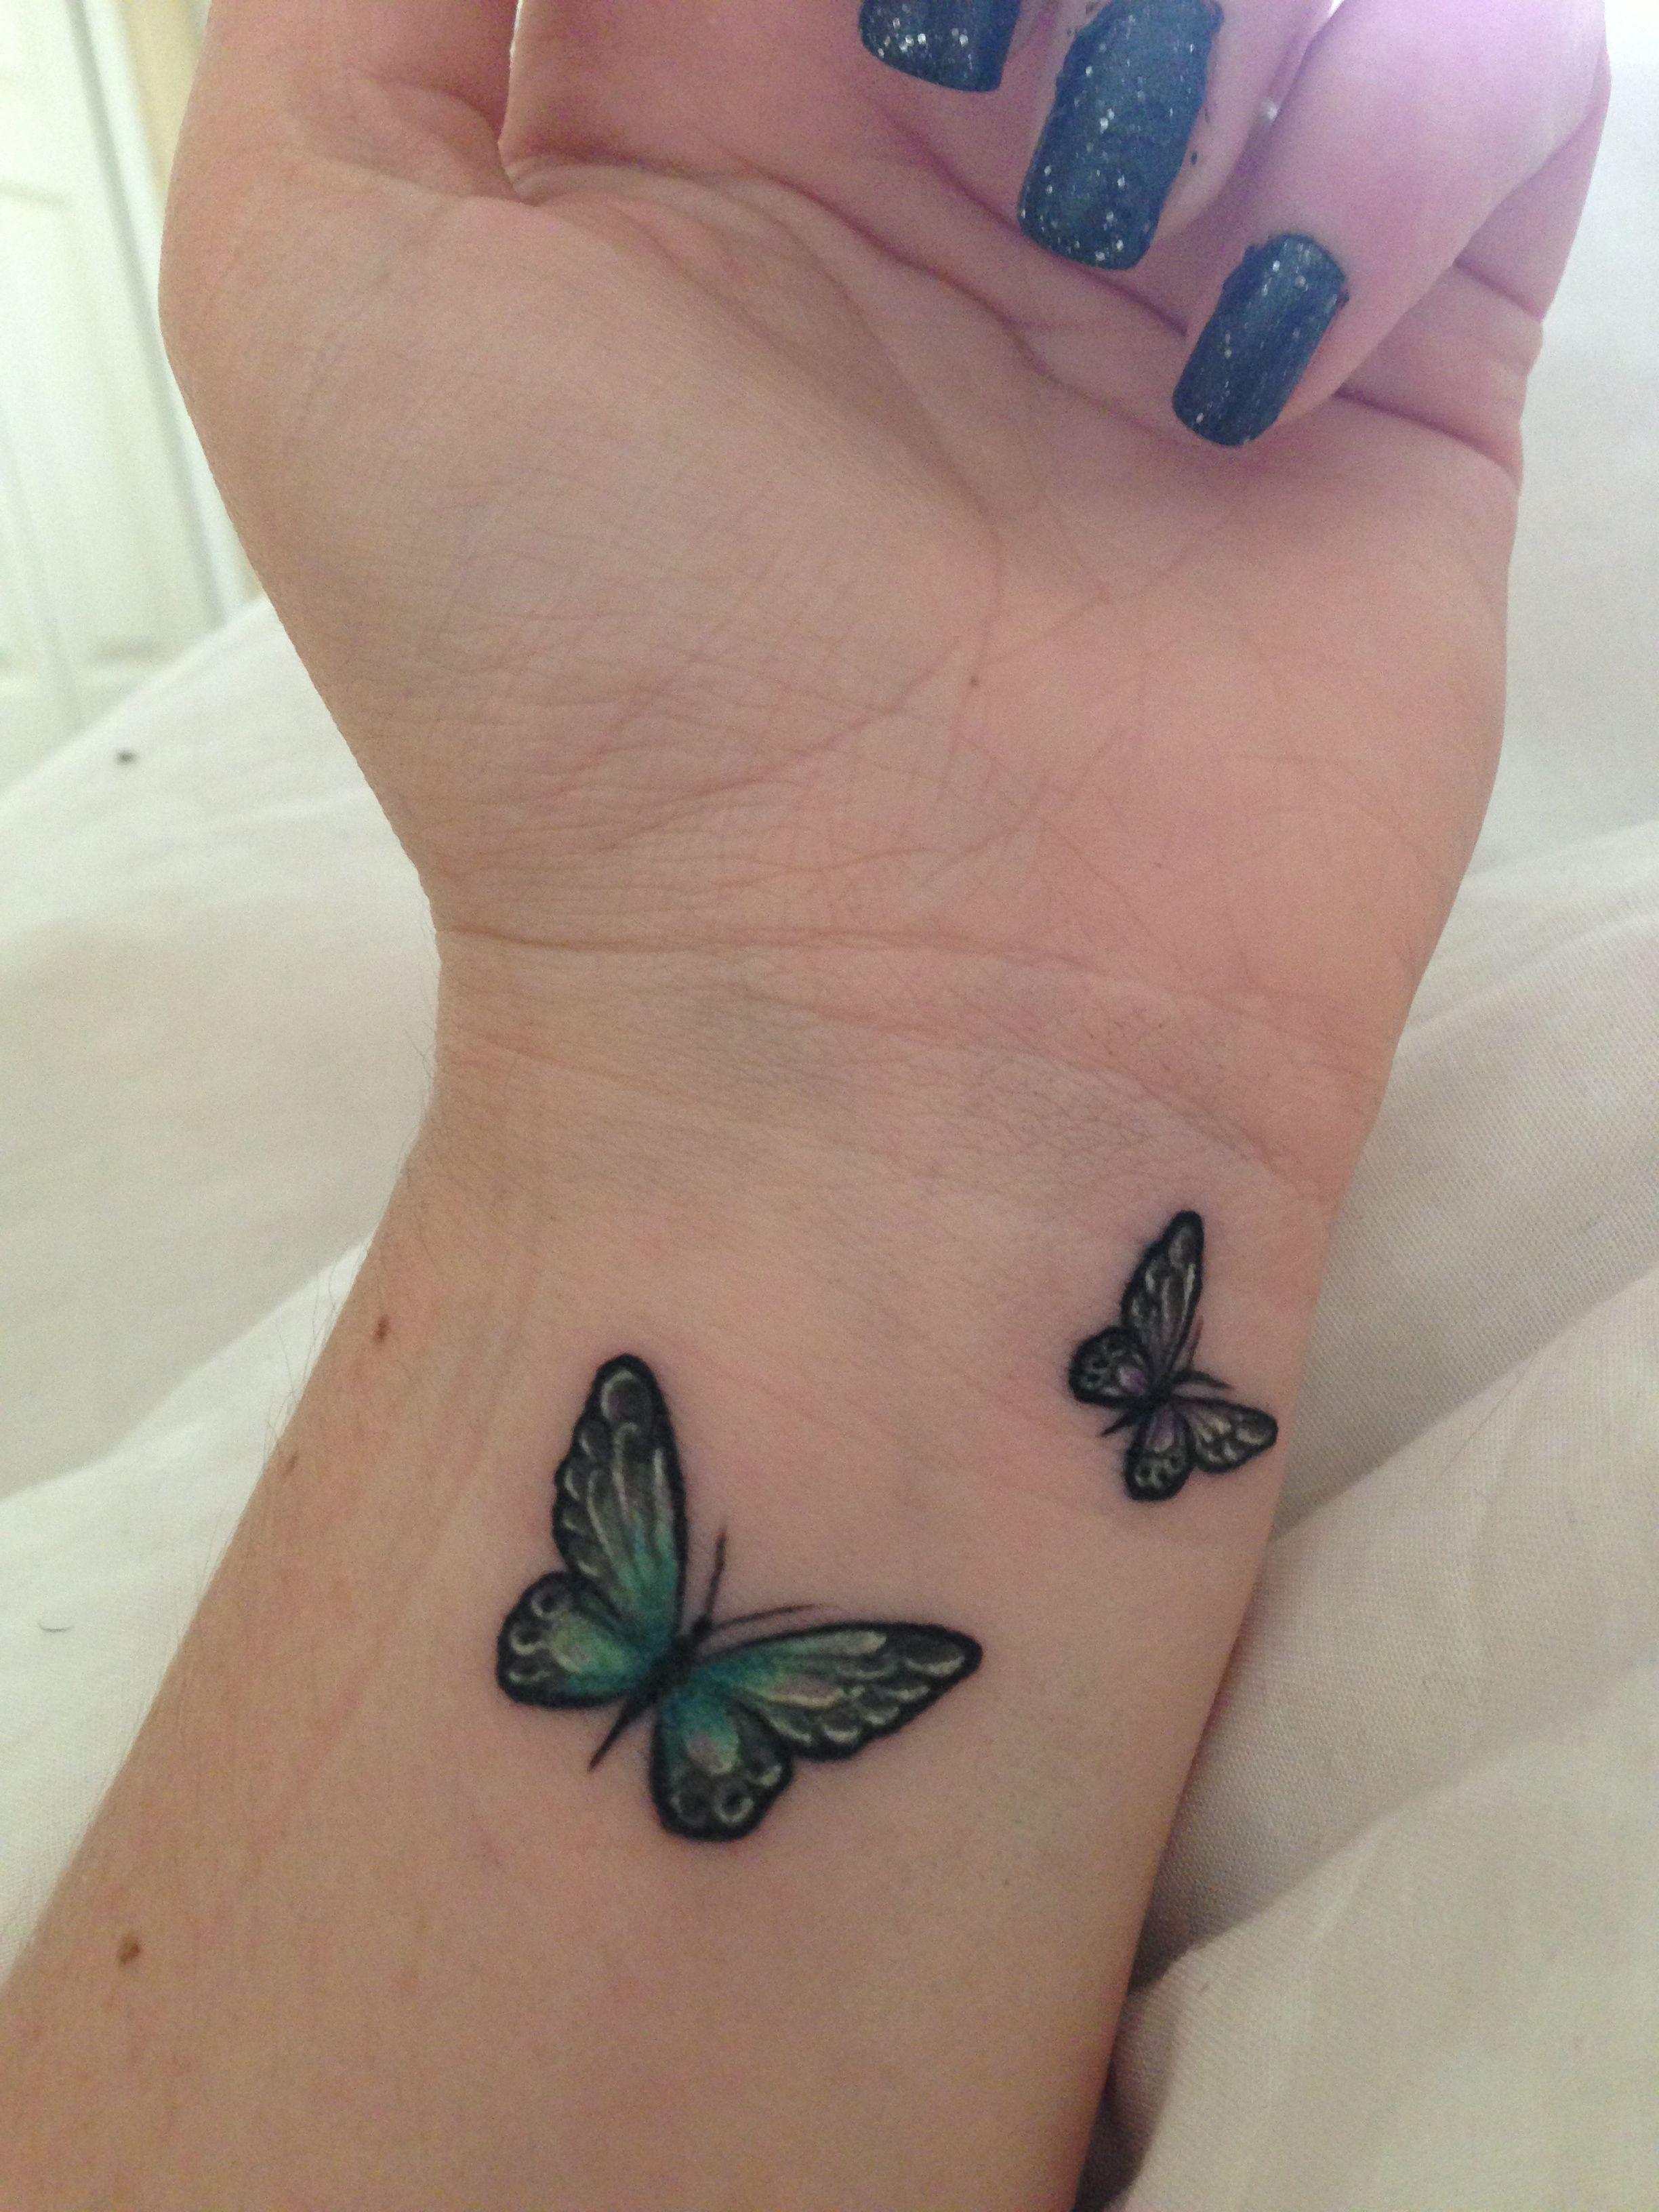 Pin By Debbie Probst On Tattoos Butterfly Wrist Tattoo Butterfly Tattoos For Women Small Wrist Tattoos